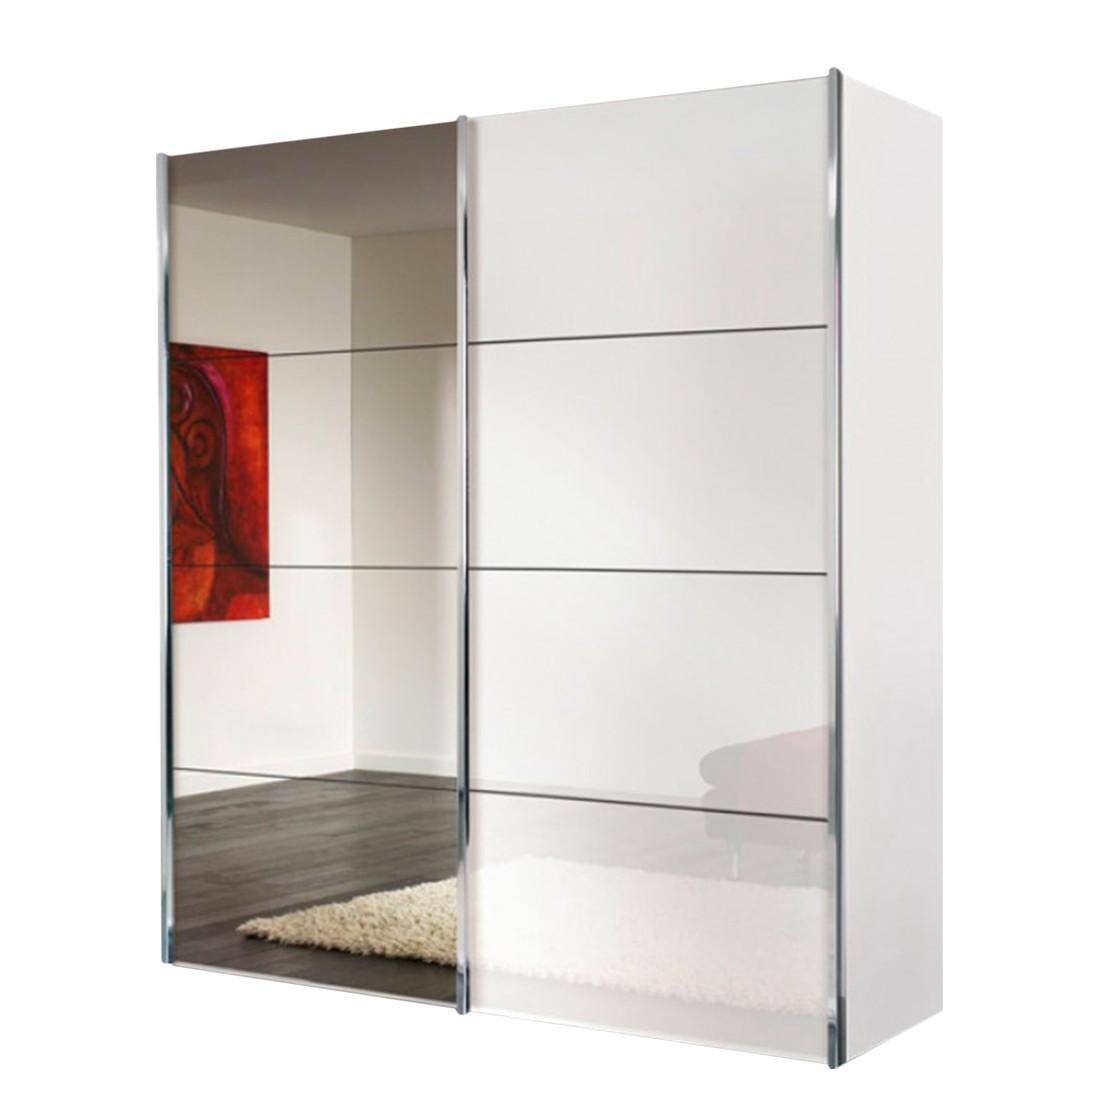 solutions archive seite 13 von 14. Black Bedroom Furniture Sets. Home Design Ideas